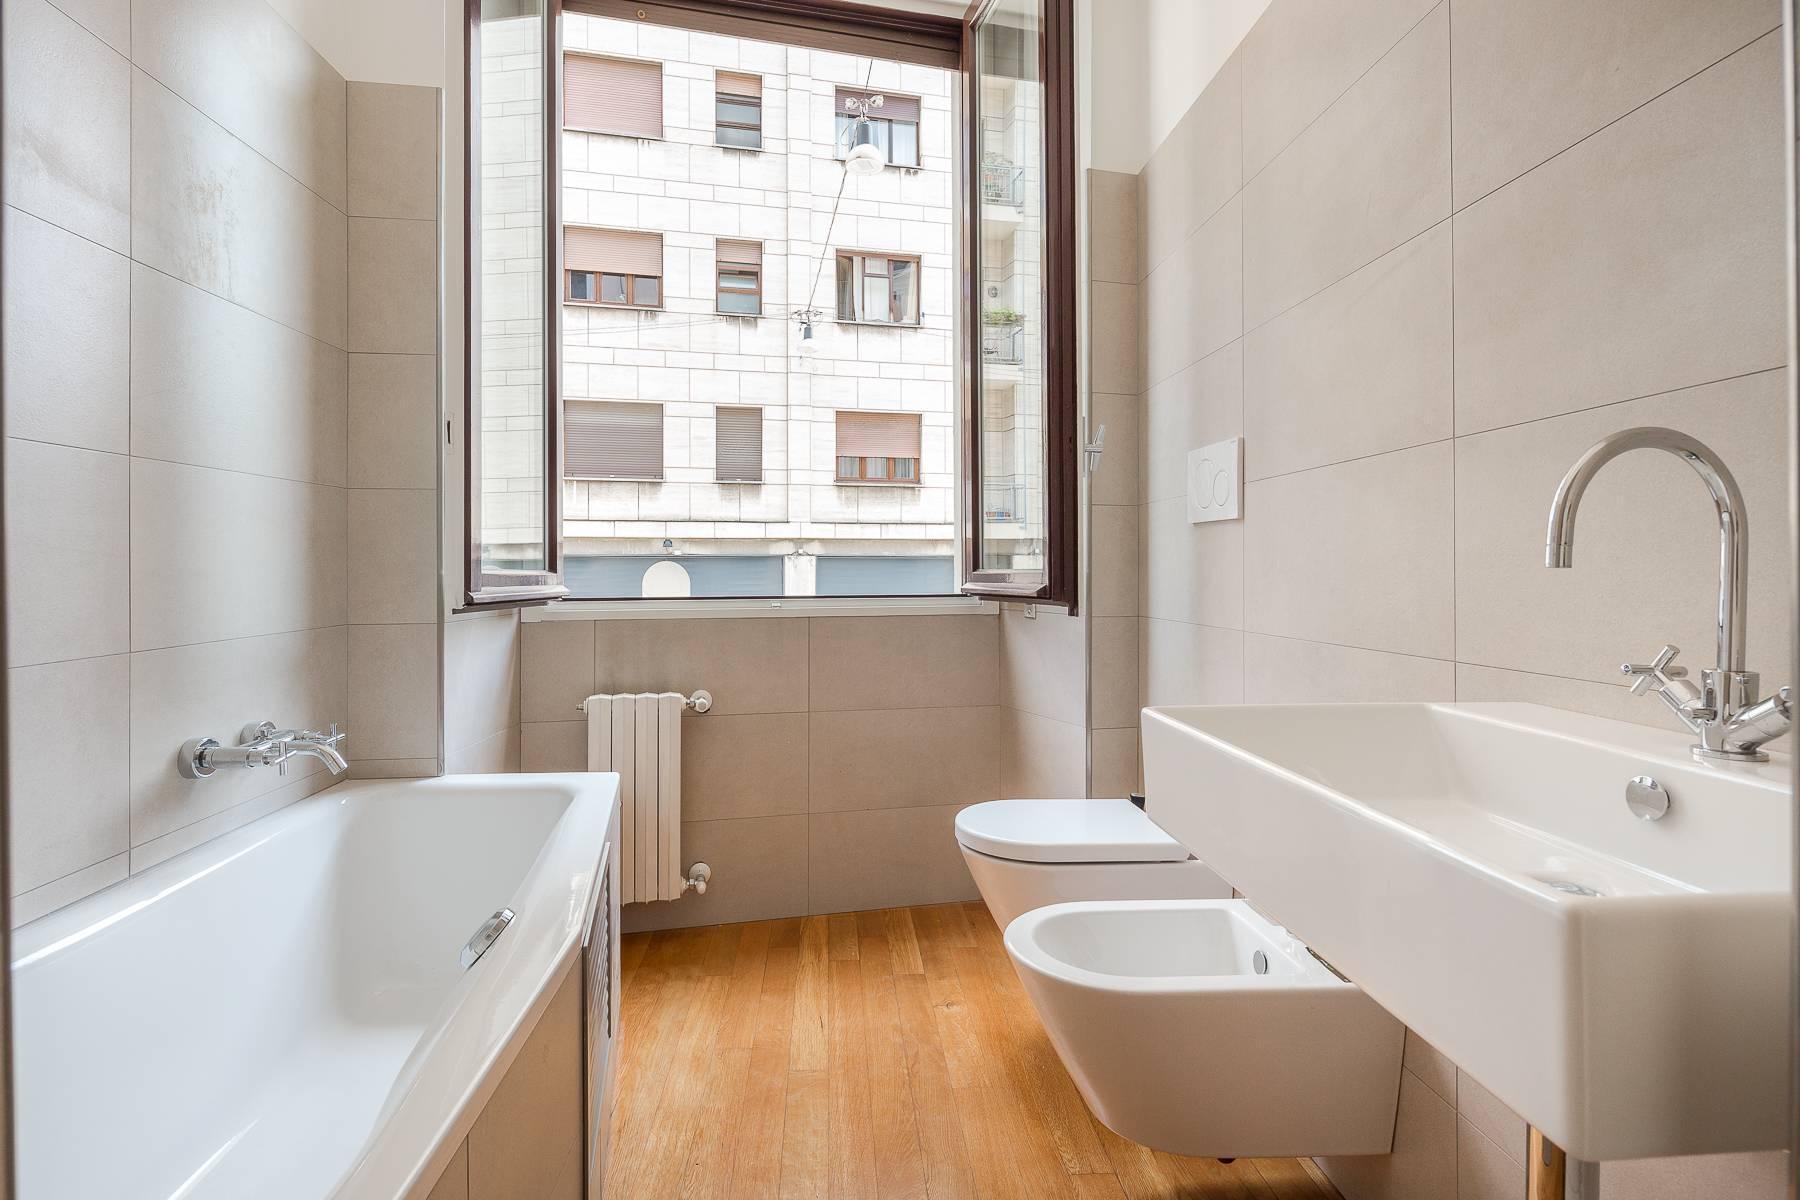 Apartment in an elegant period building located in a prestigious city district - 14